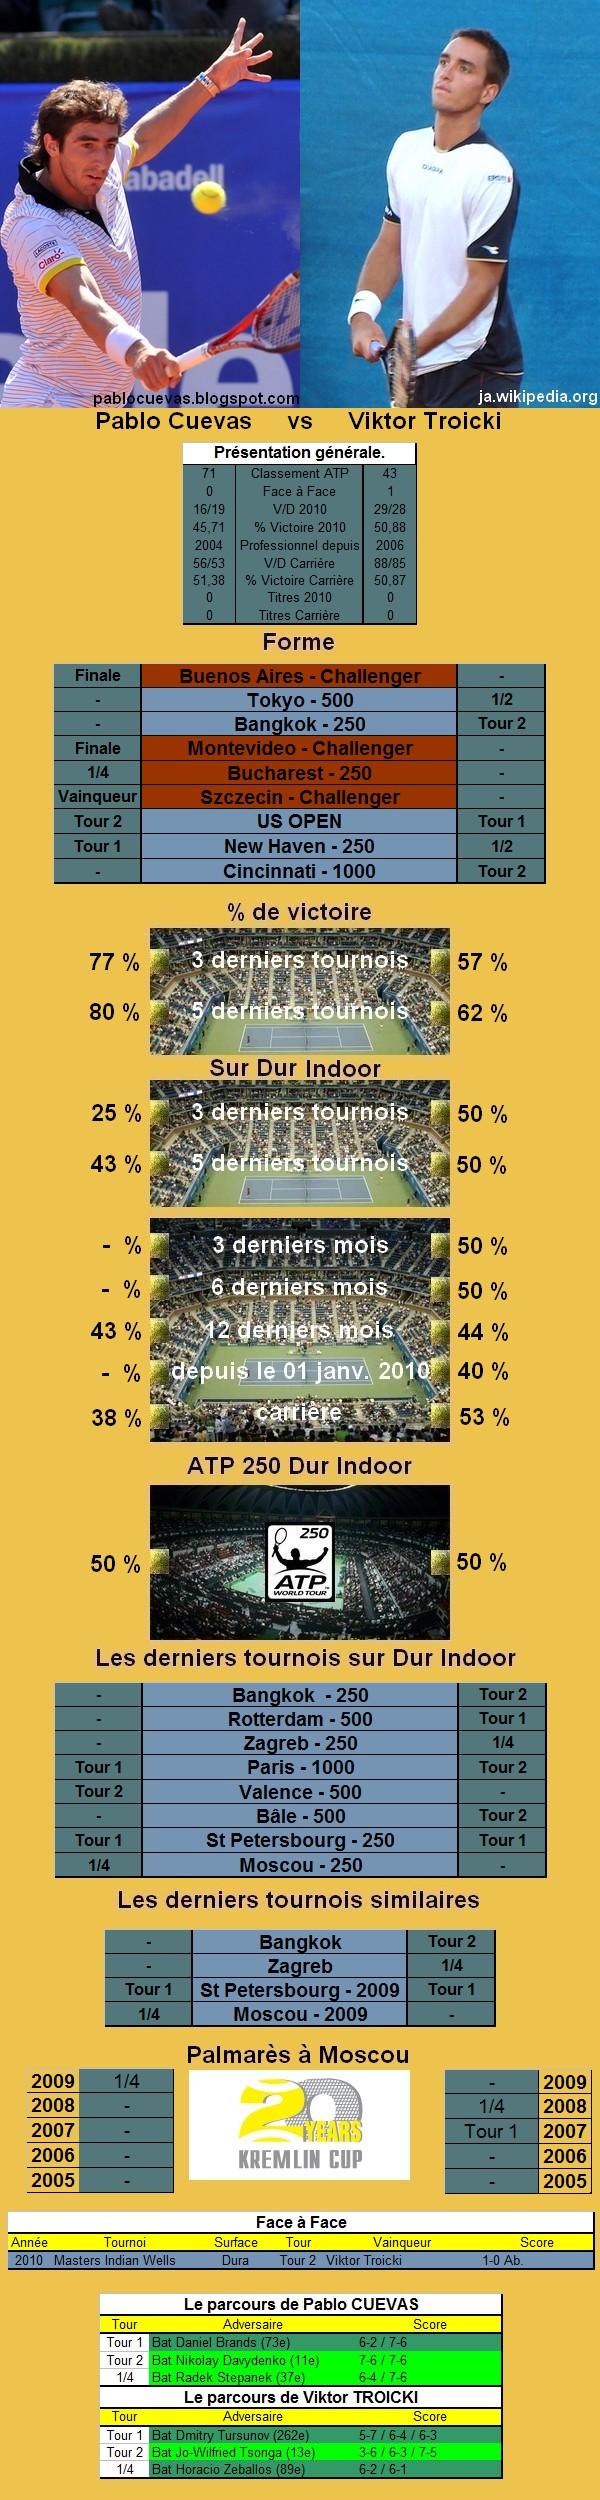 Statistiques tennis de Cuevas contre Troicki à Moscou